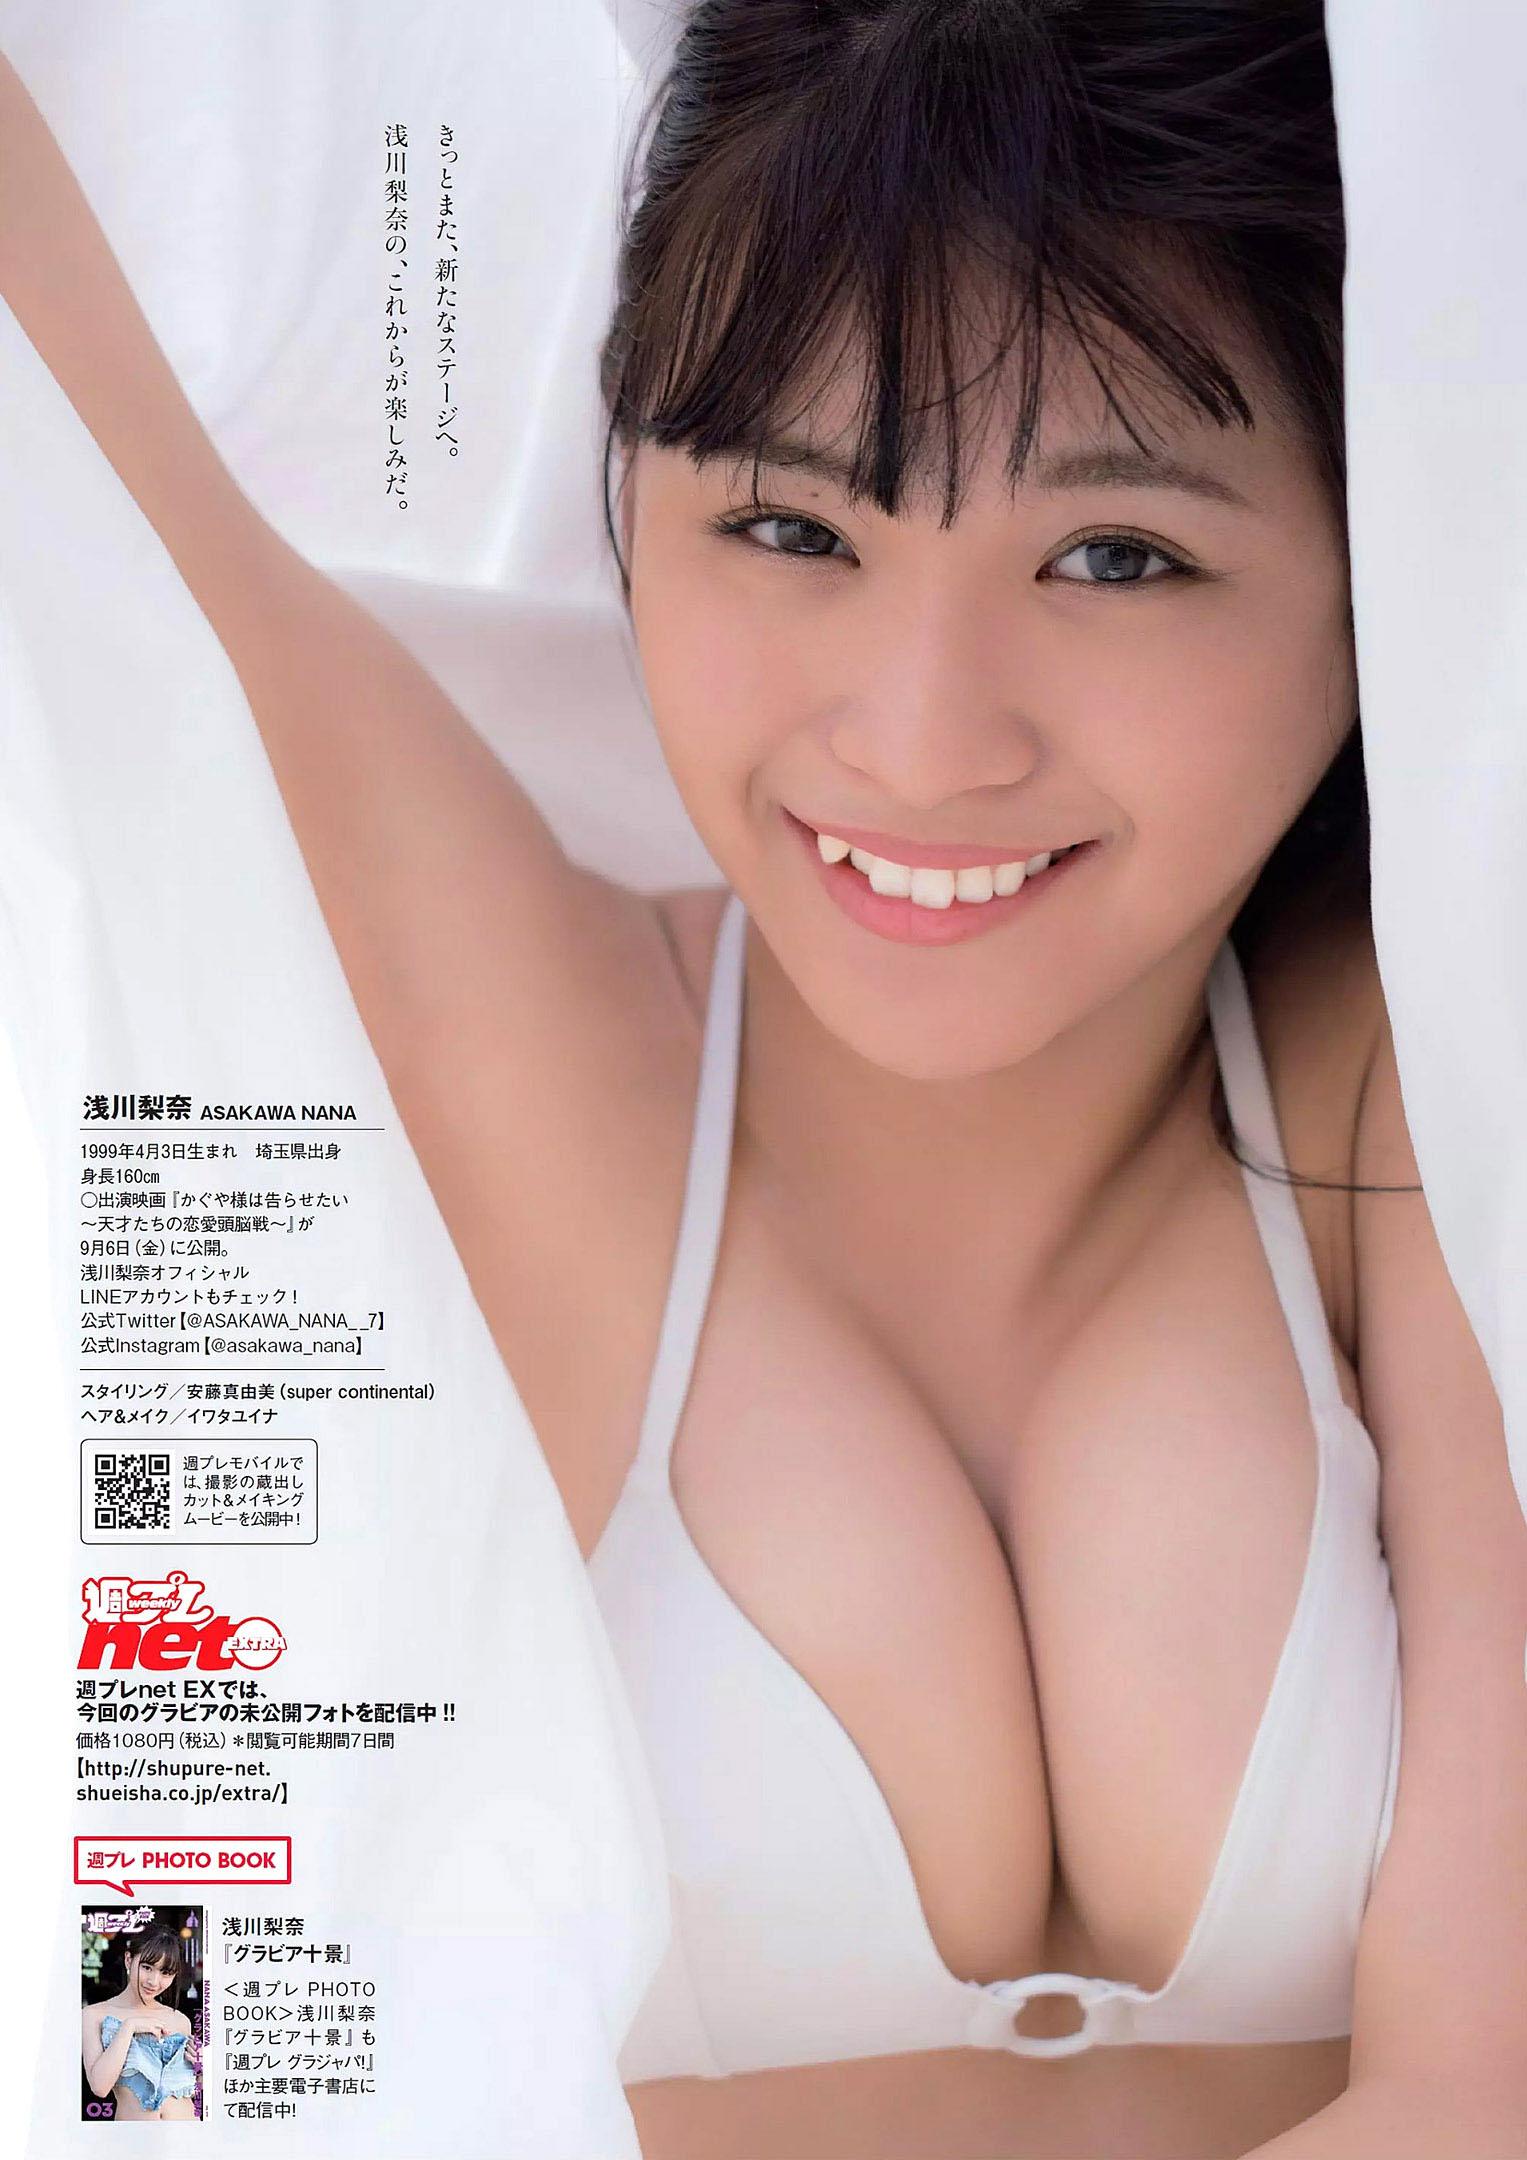 Nana Asakawa WBP 190916 10.jpg